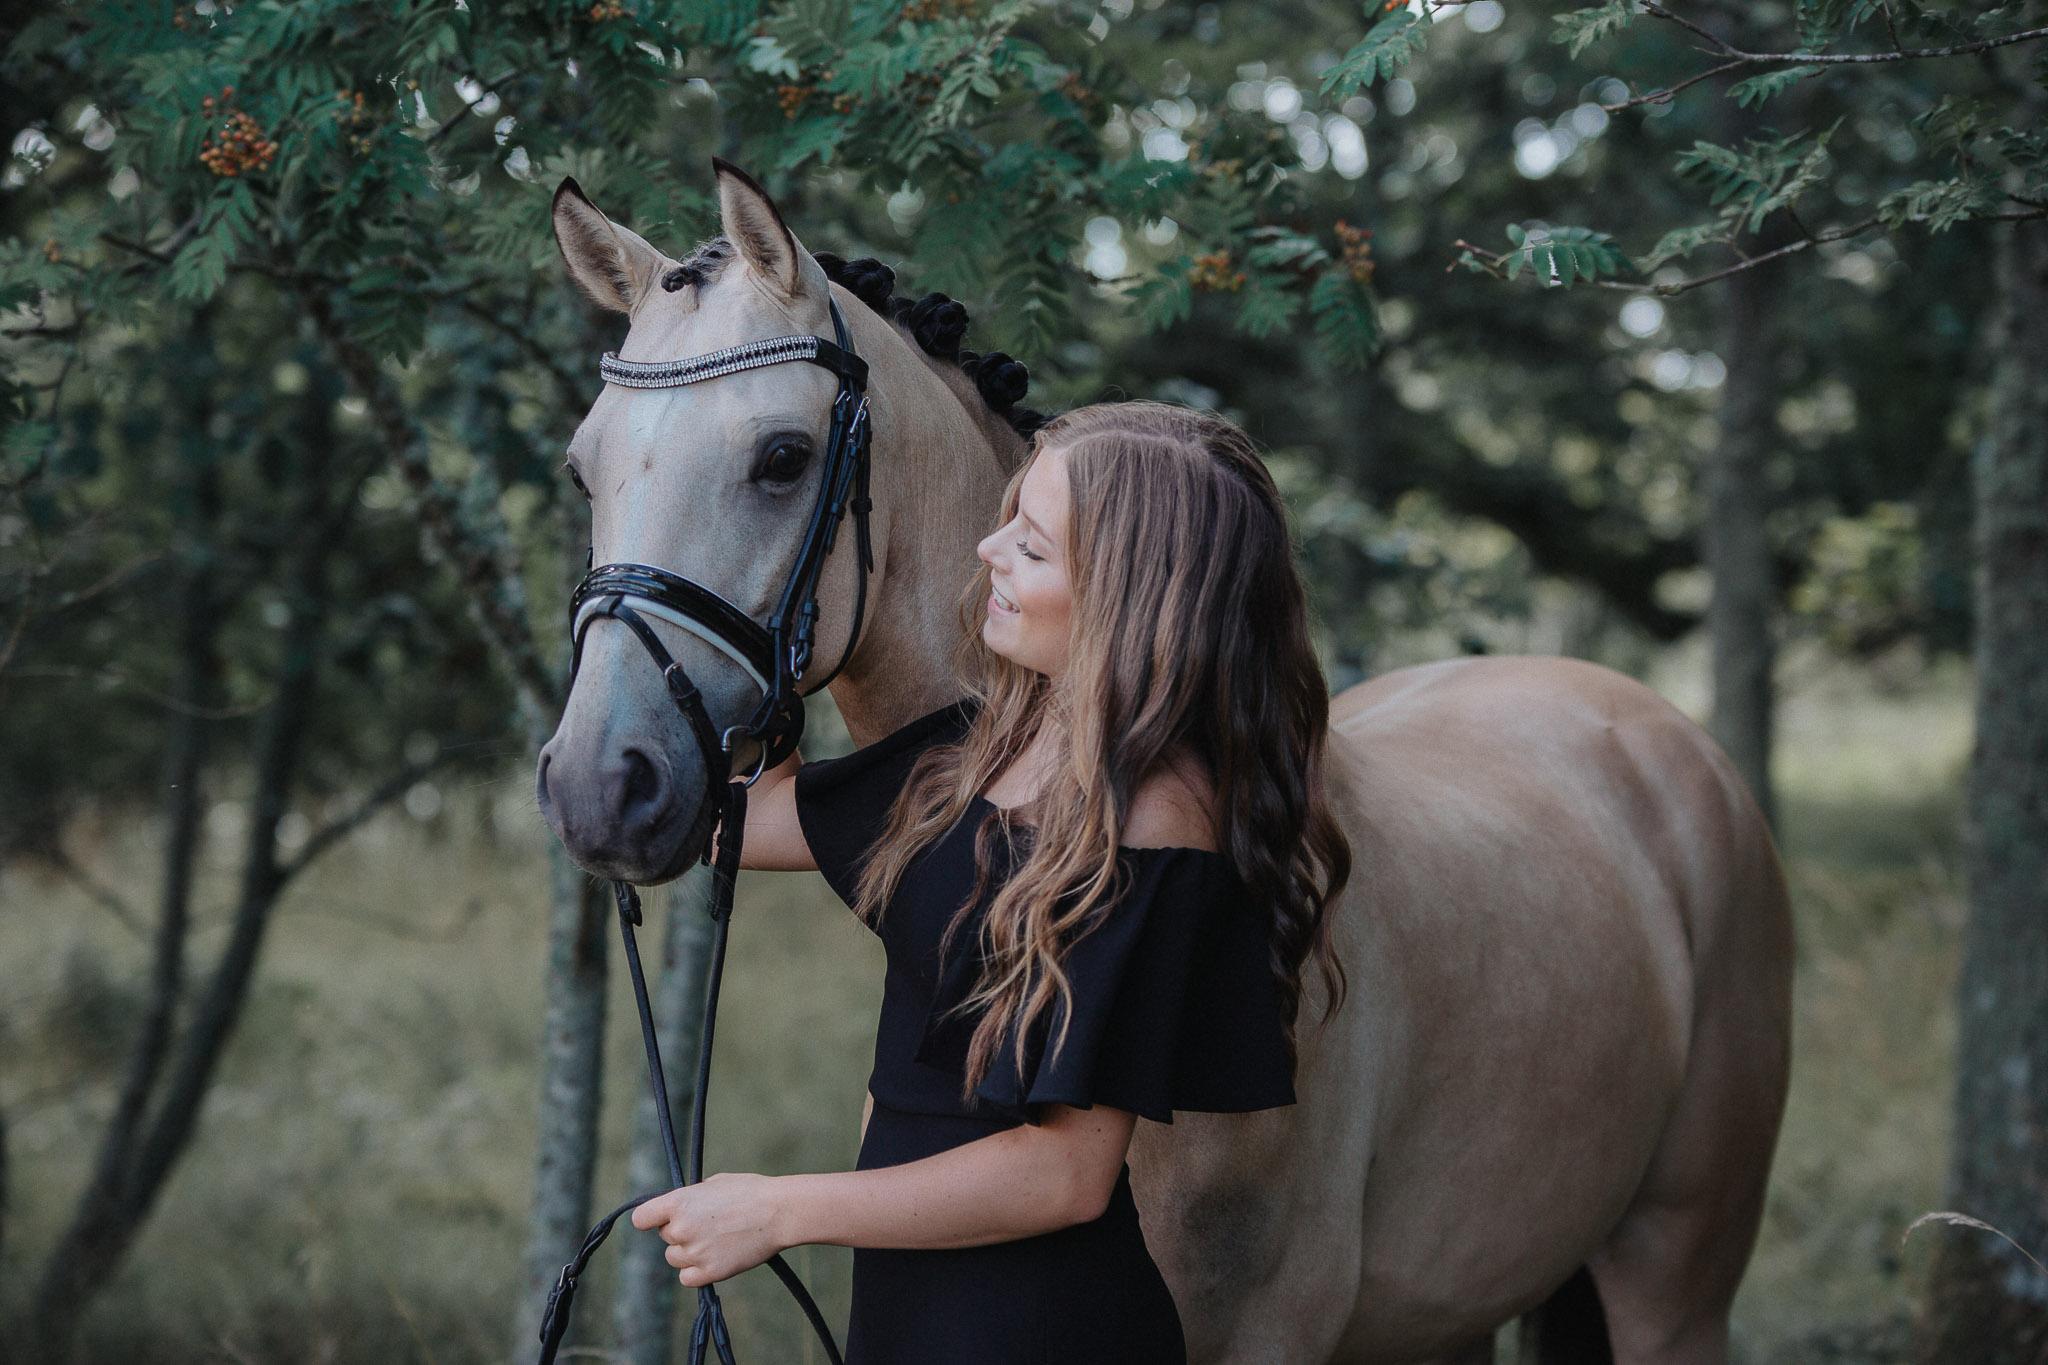 Ebba Nilsson Ebbadressage Hamilton silver Ponny-SM 2019 Annatarfoto